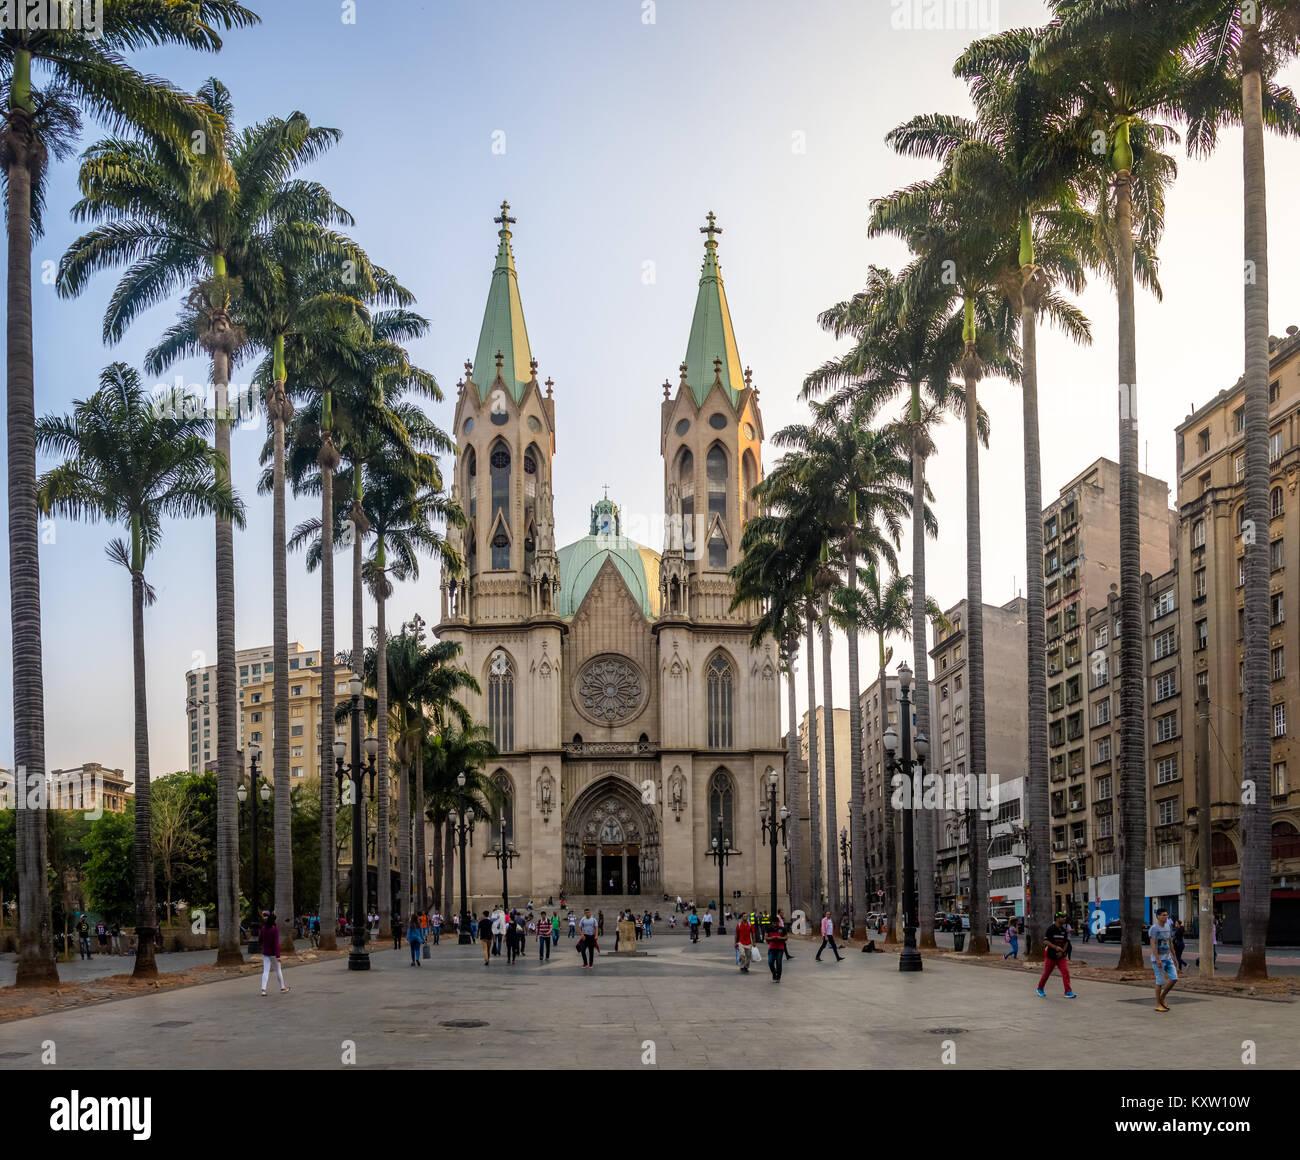 Se Cathedral - Sao Paulo, Brazil - Stock Image